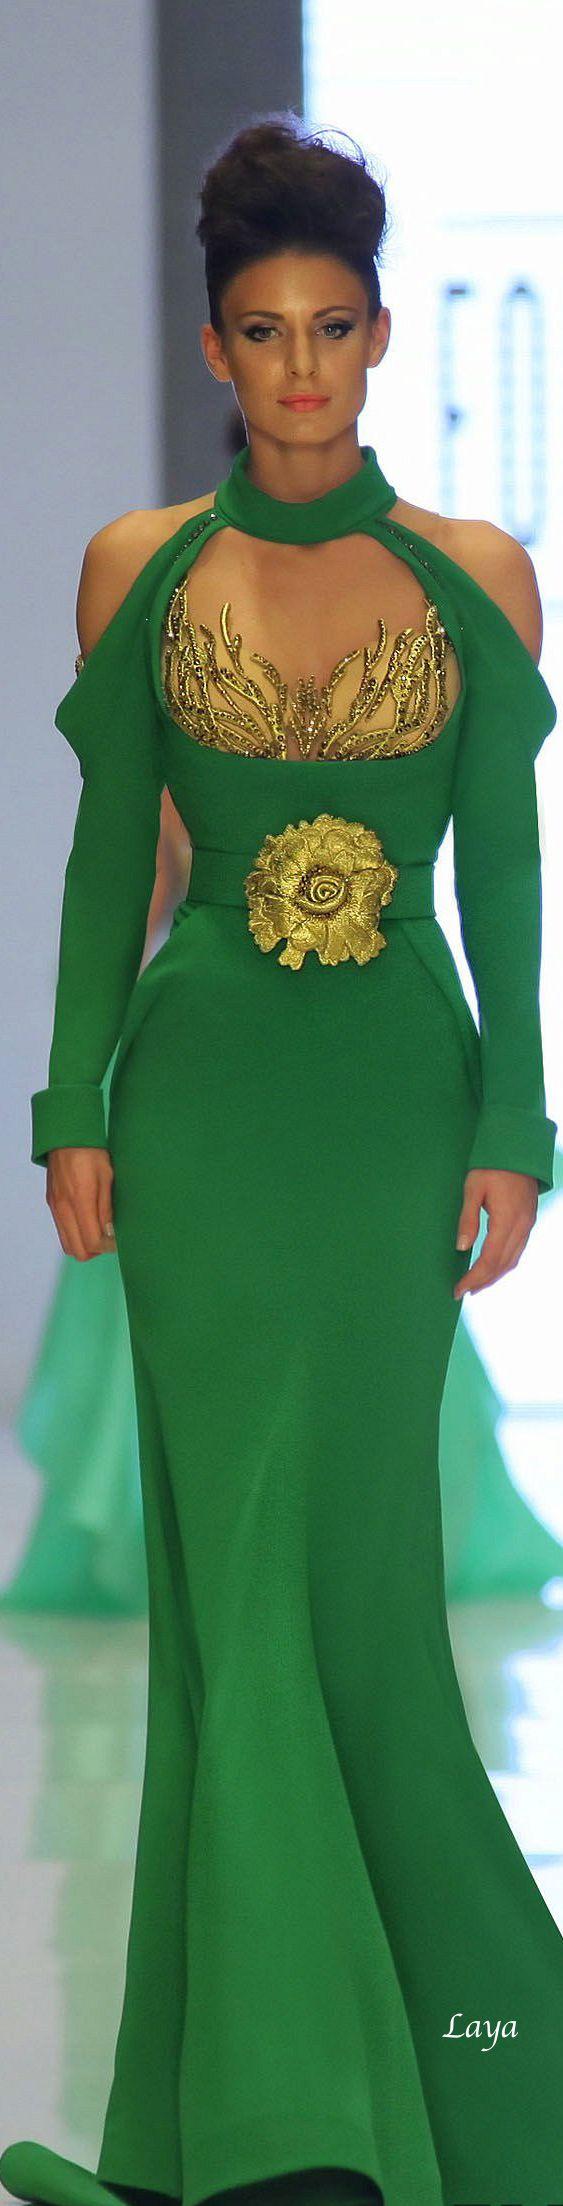 Fouad Sarkis Spring-Summer 2014 Couture jaglady